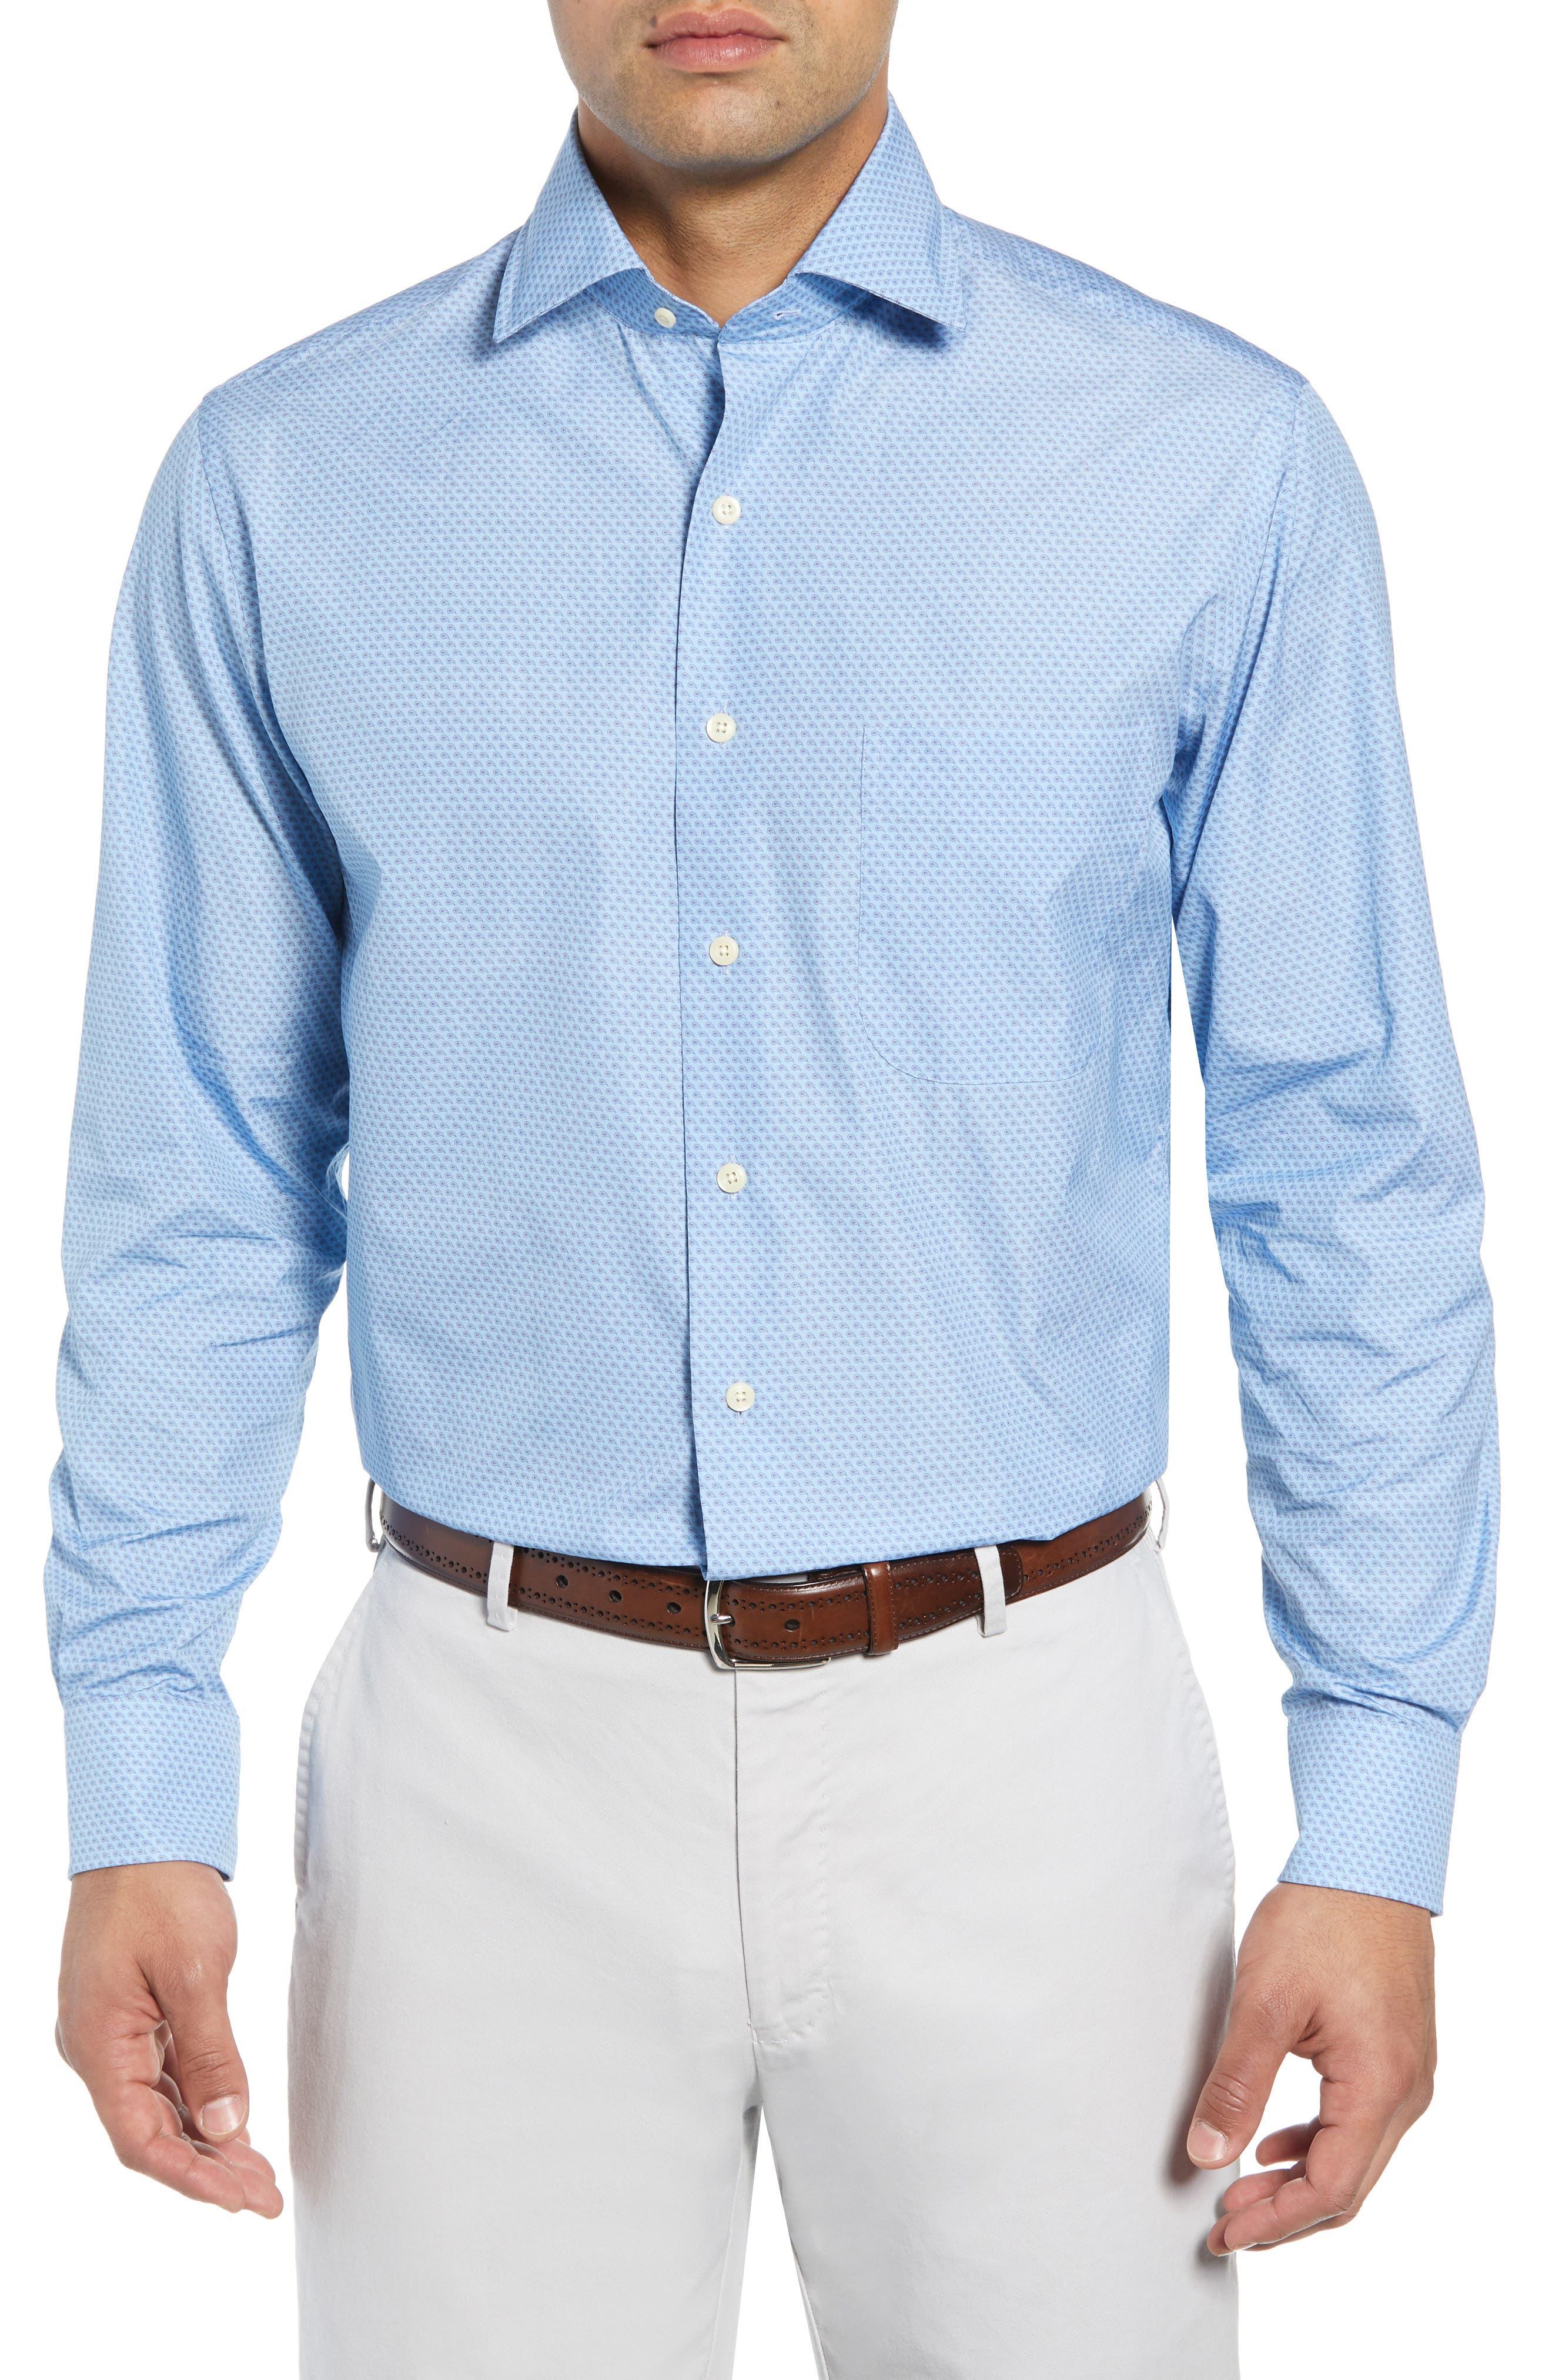 Niblick Regular Fit Sport Shirt,                             Main thumbnail 1, color,                             BLUE